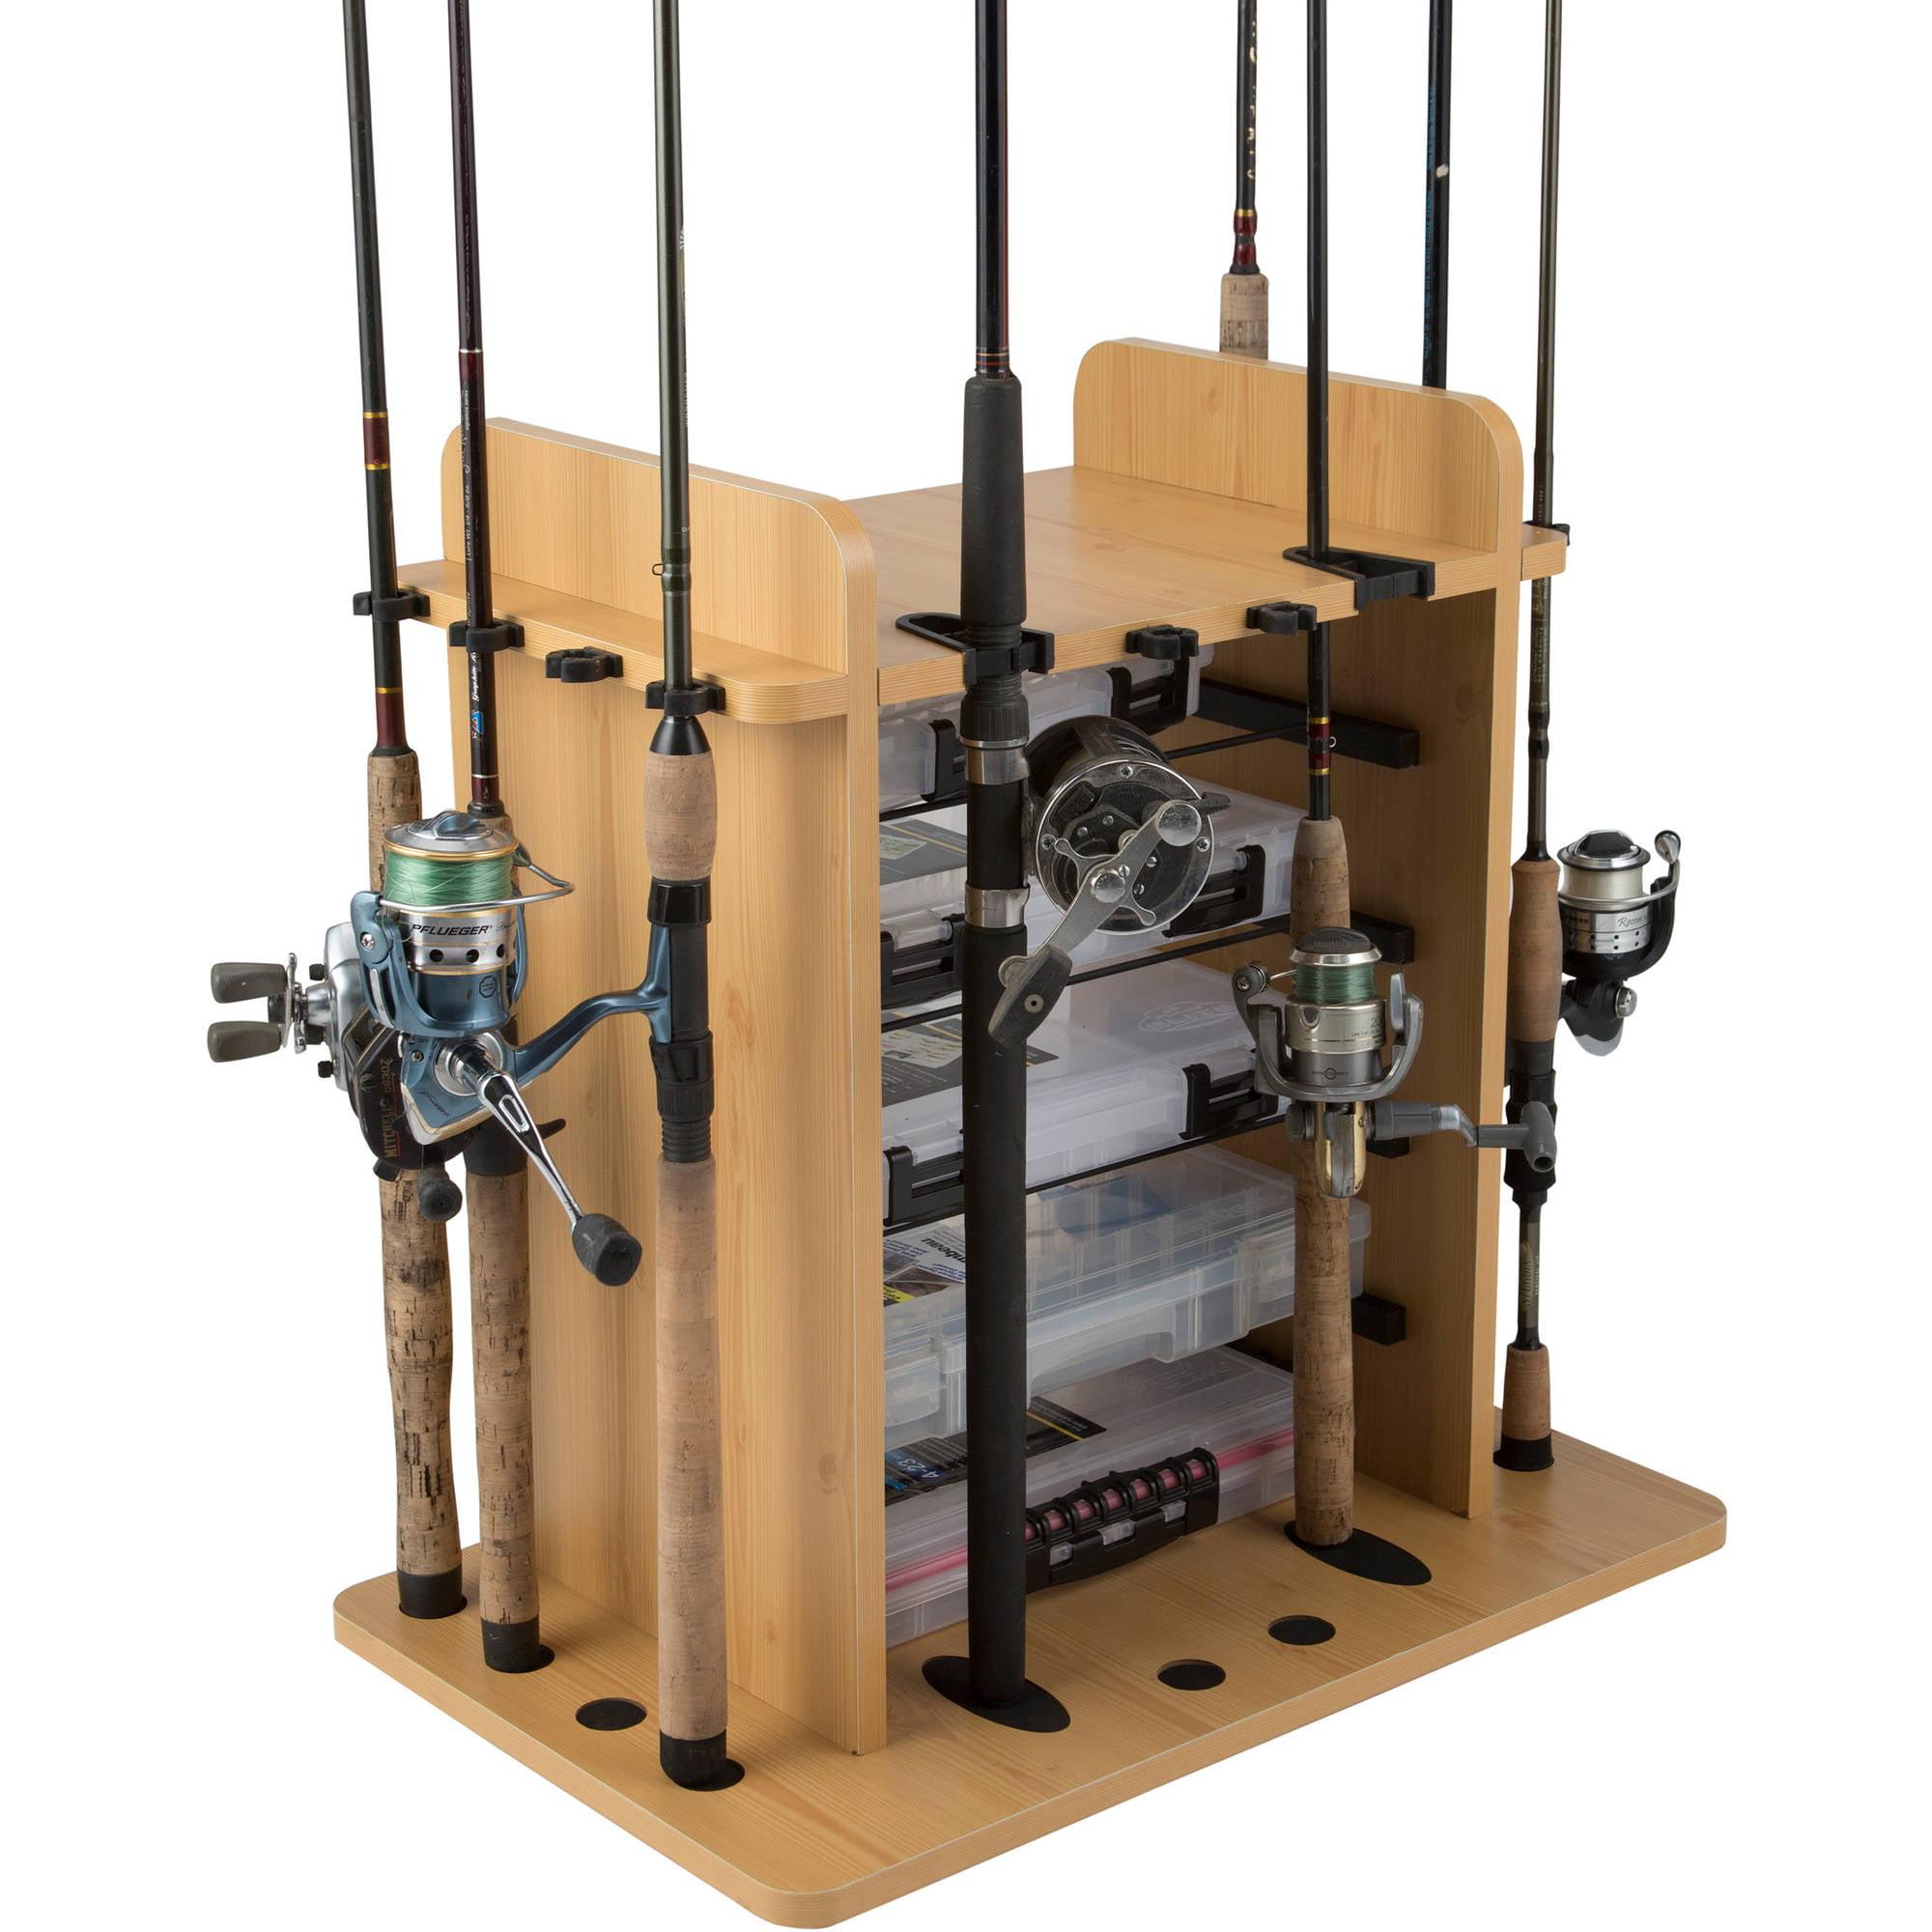 Click here to buy Rush Creek Creations 14 Fishing Rod Rack with 4 Bait Bin Storage by Rush Creek Creations.